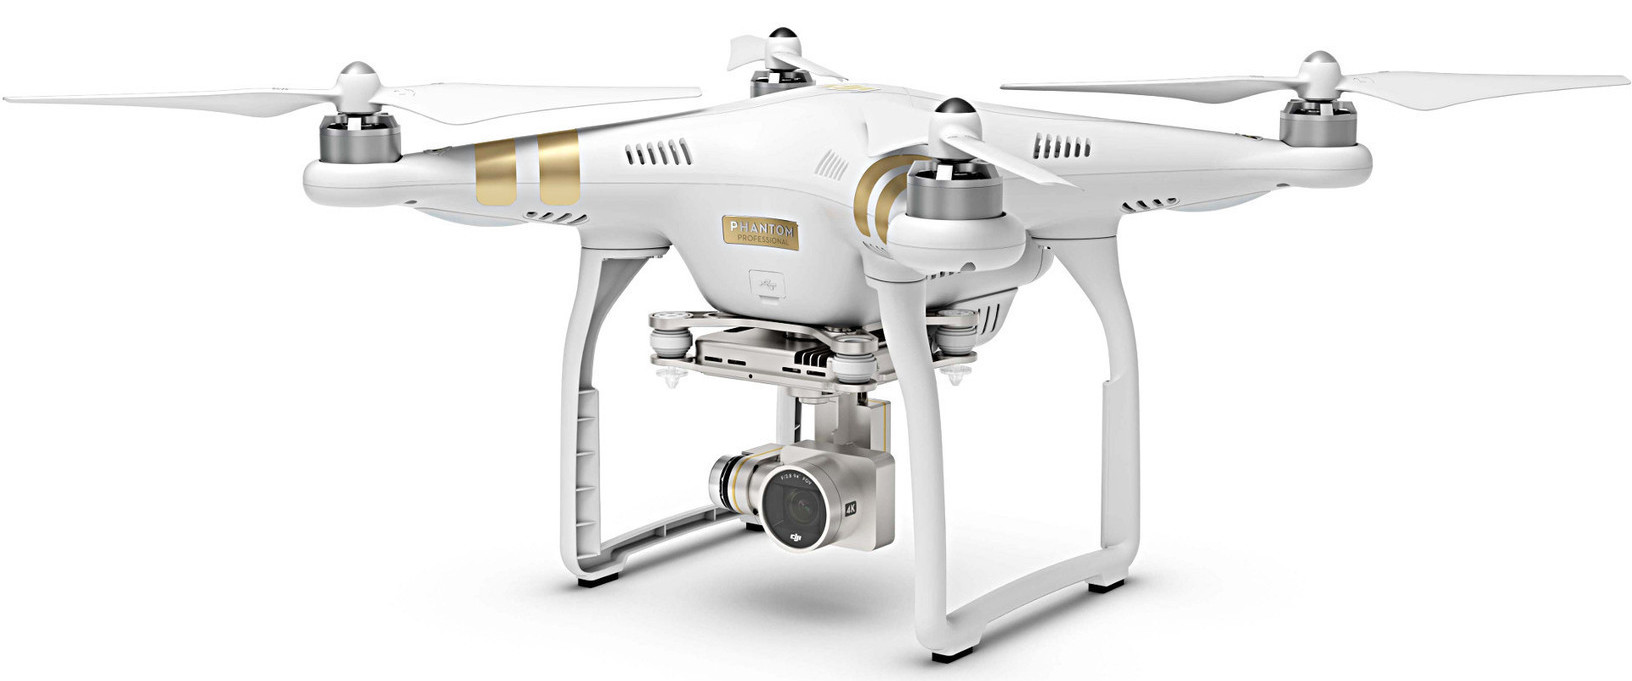 Quadcopter с камерой DJI Phantom 3 Professional